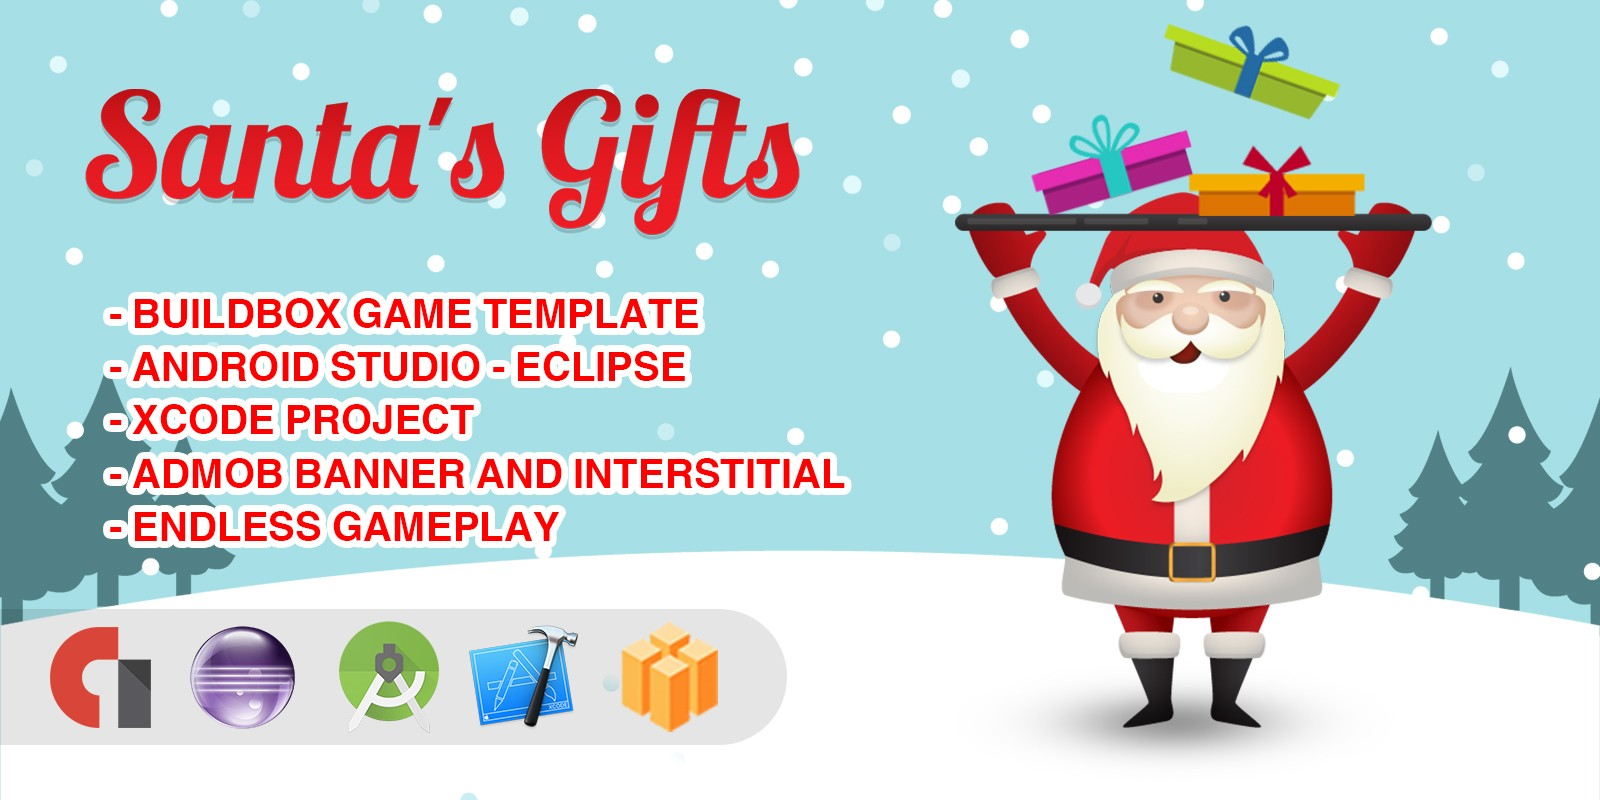 Santas Gifts - Buildbox Game Template